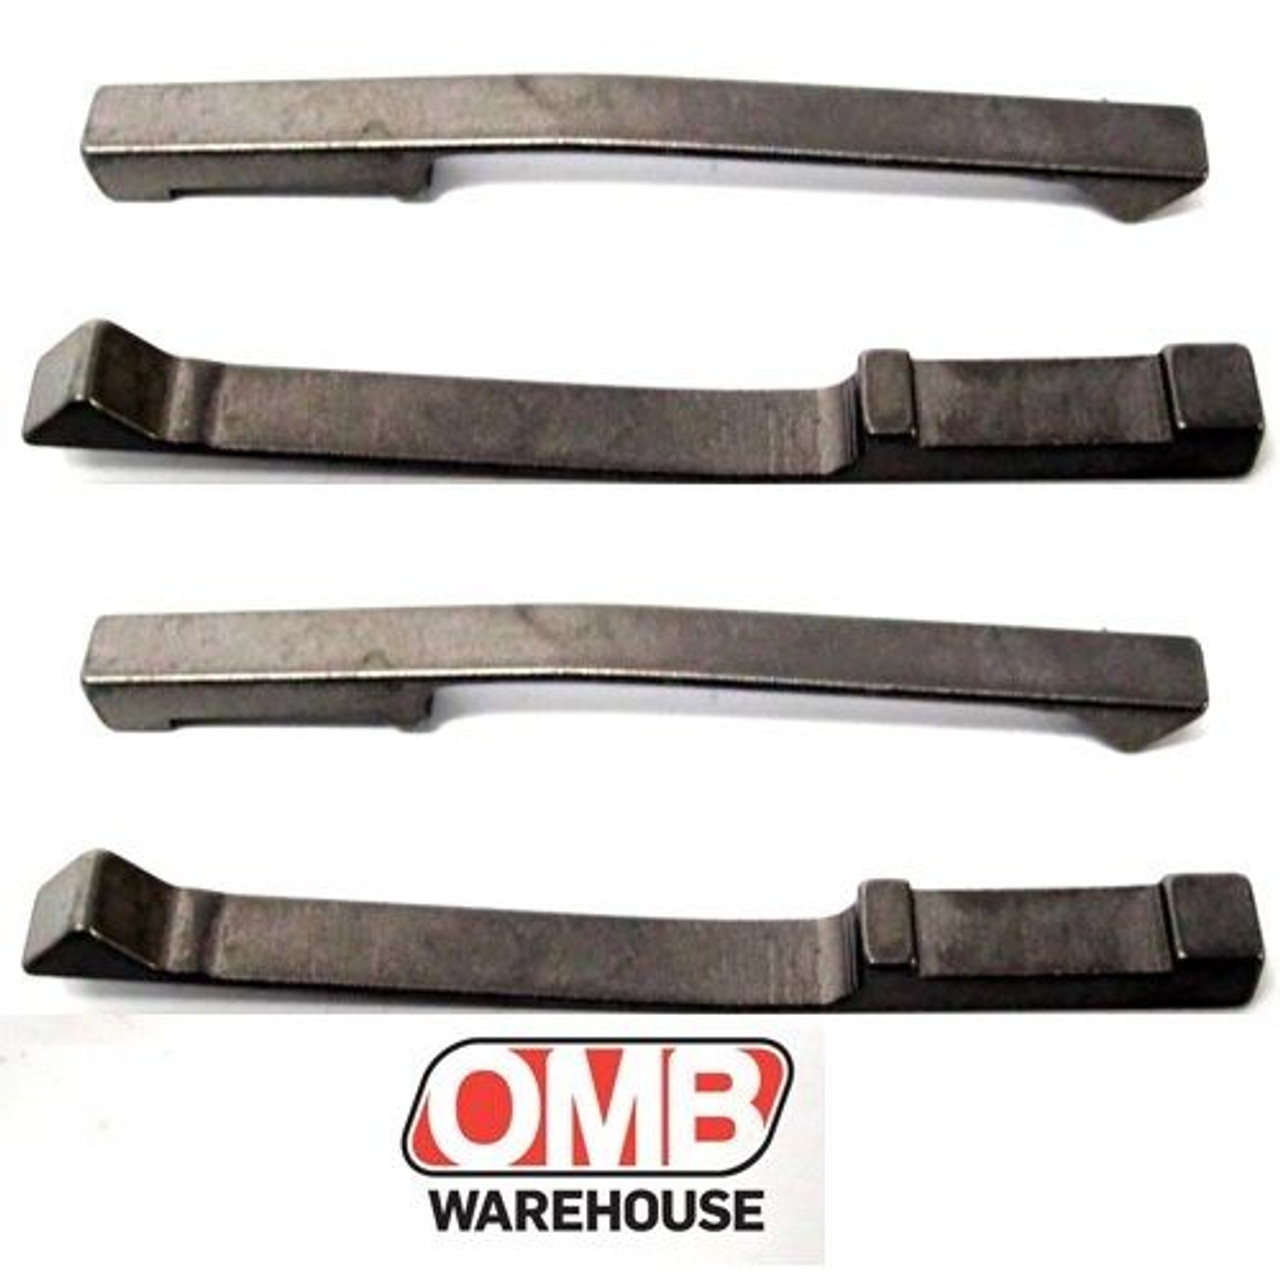 (4) Tecumseh 792089B OEM MTD Shift Keys Peerless 700 Transaxle Scag SC-792089B